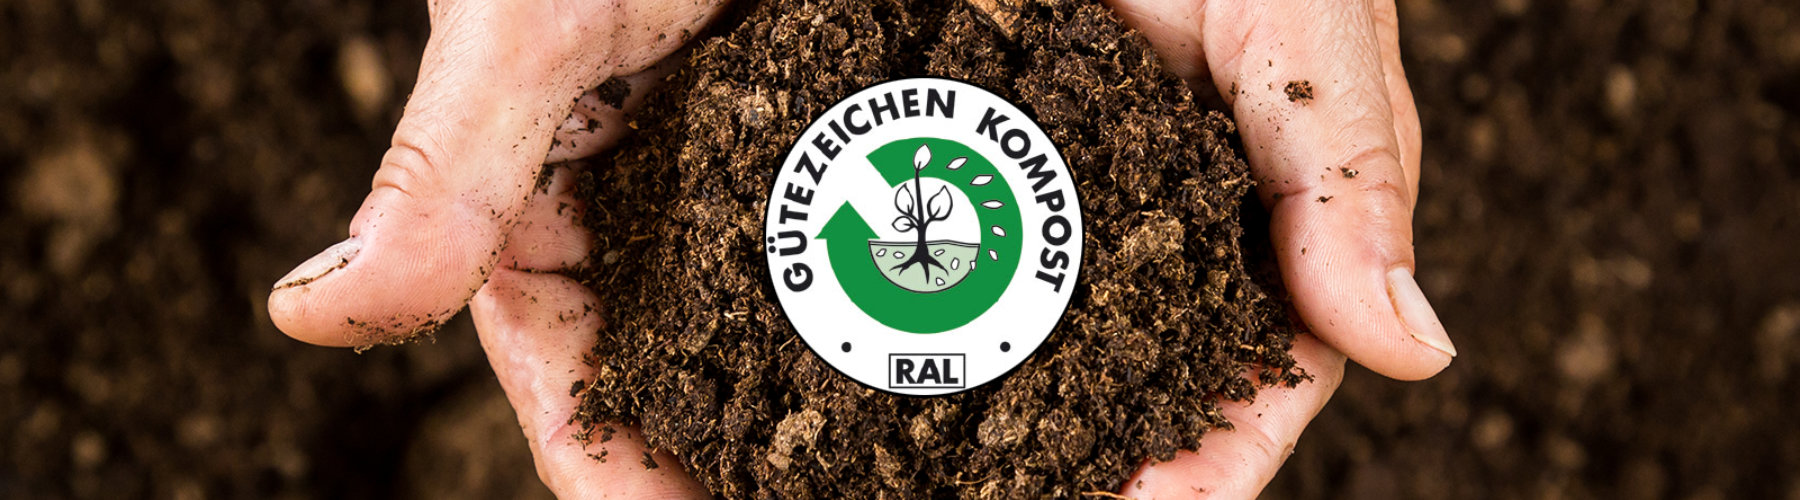 Kompostberatung_1800_500